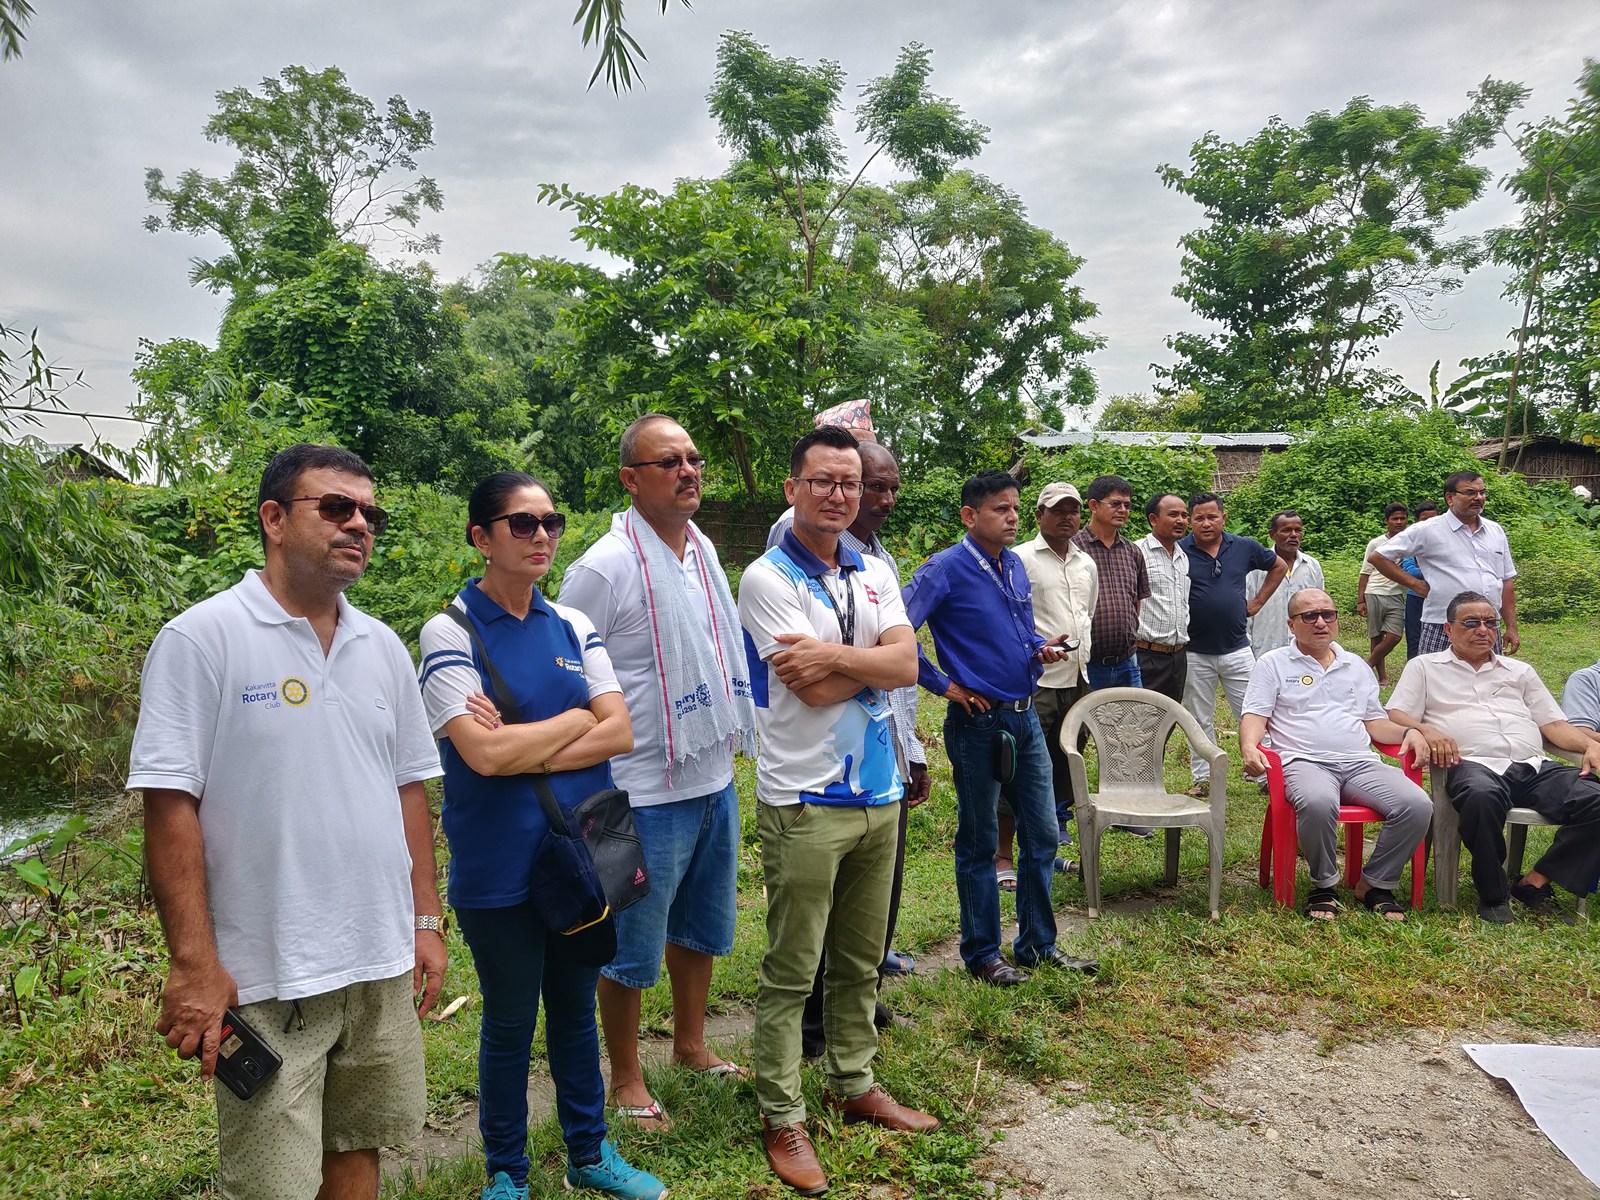 Free-Health-Camp-Eye-Screening-at-Gwala-Basti-Mechinagar-15-Jhapa-Nepal-Rotary-Club-of-Kakarvitta-11